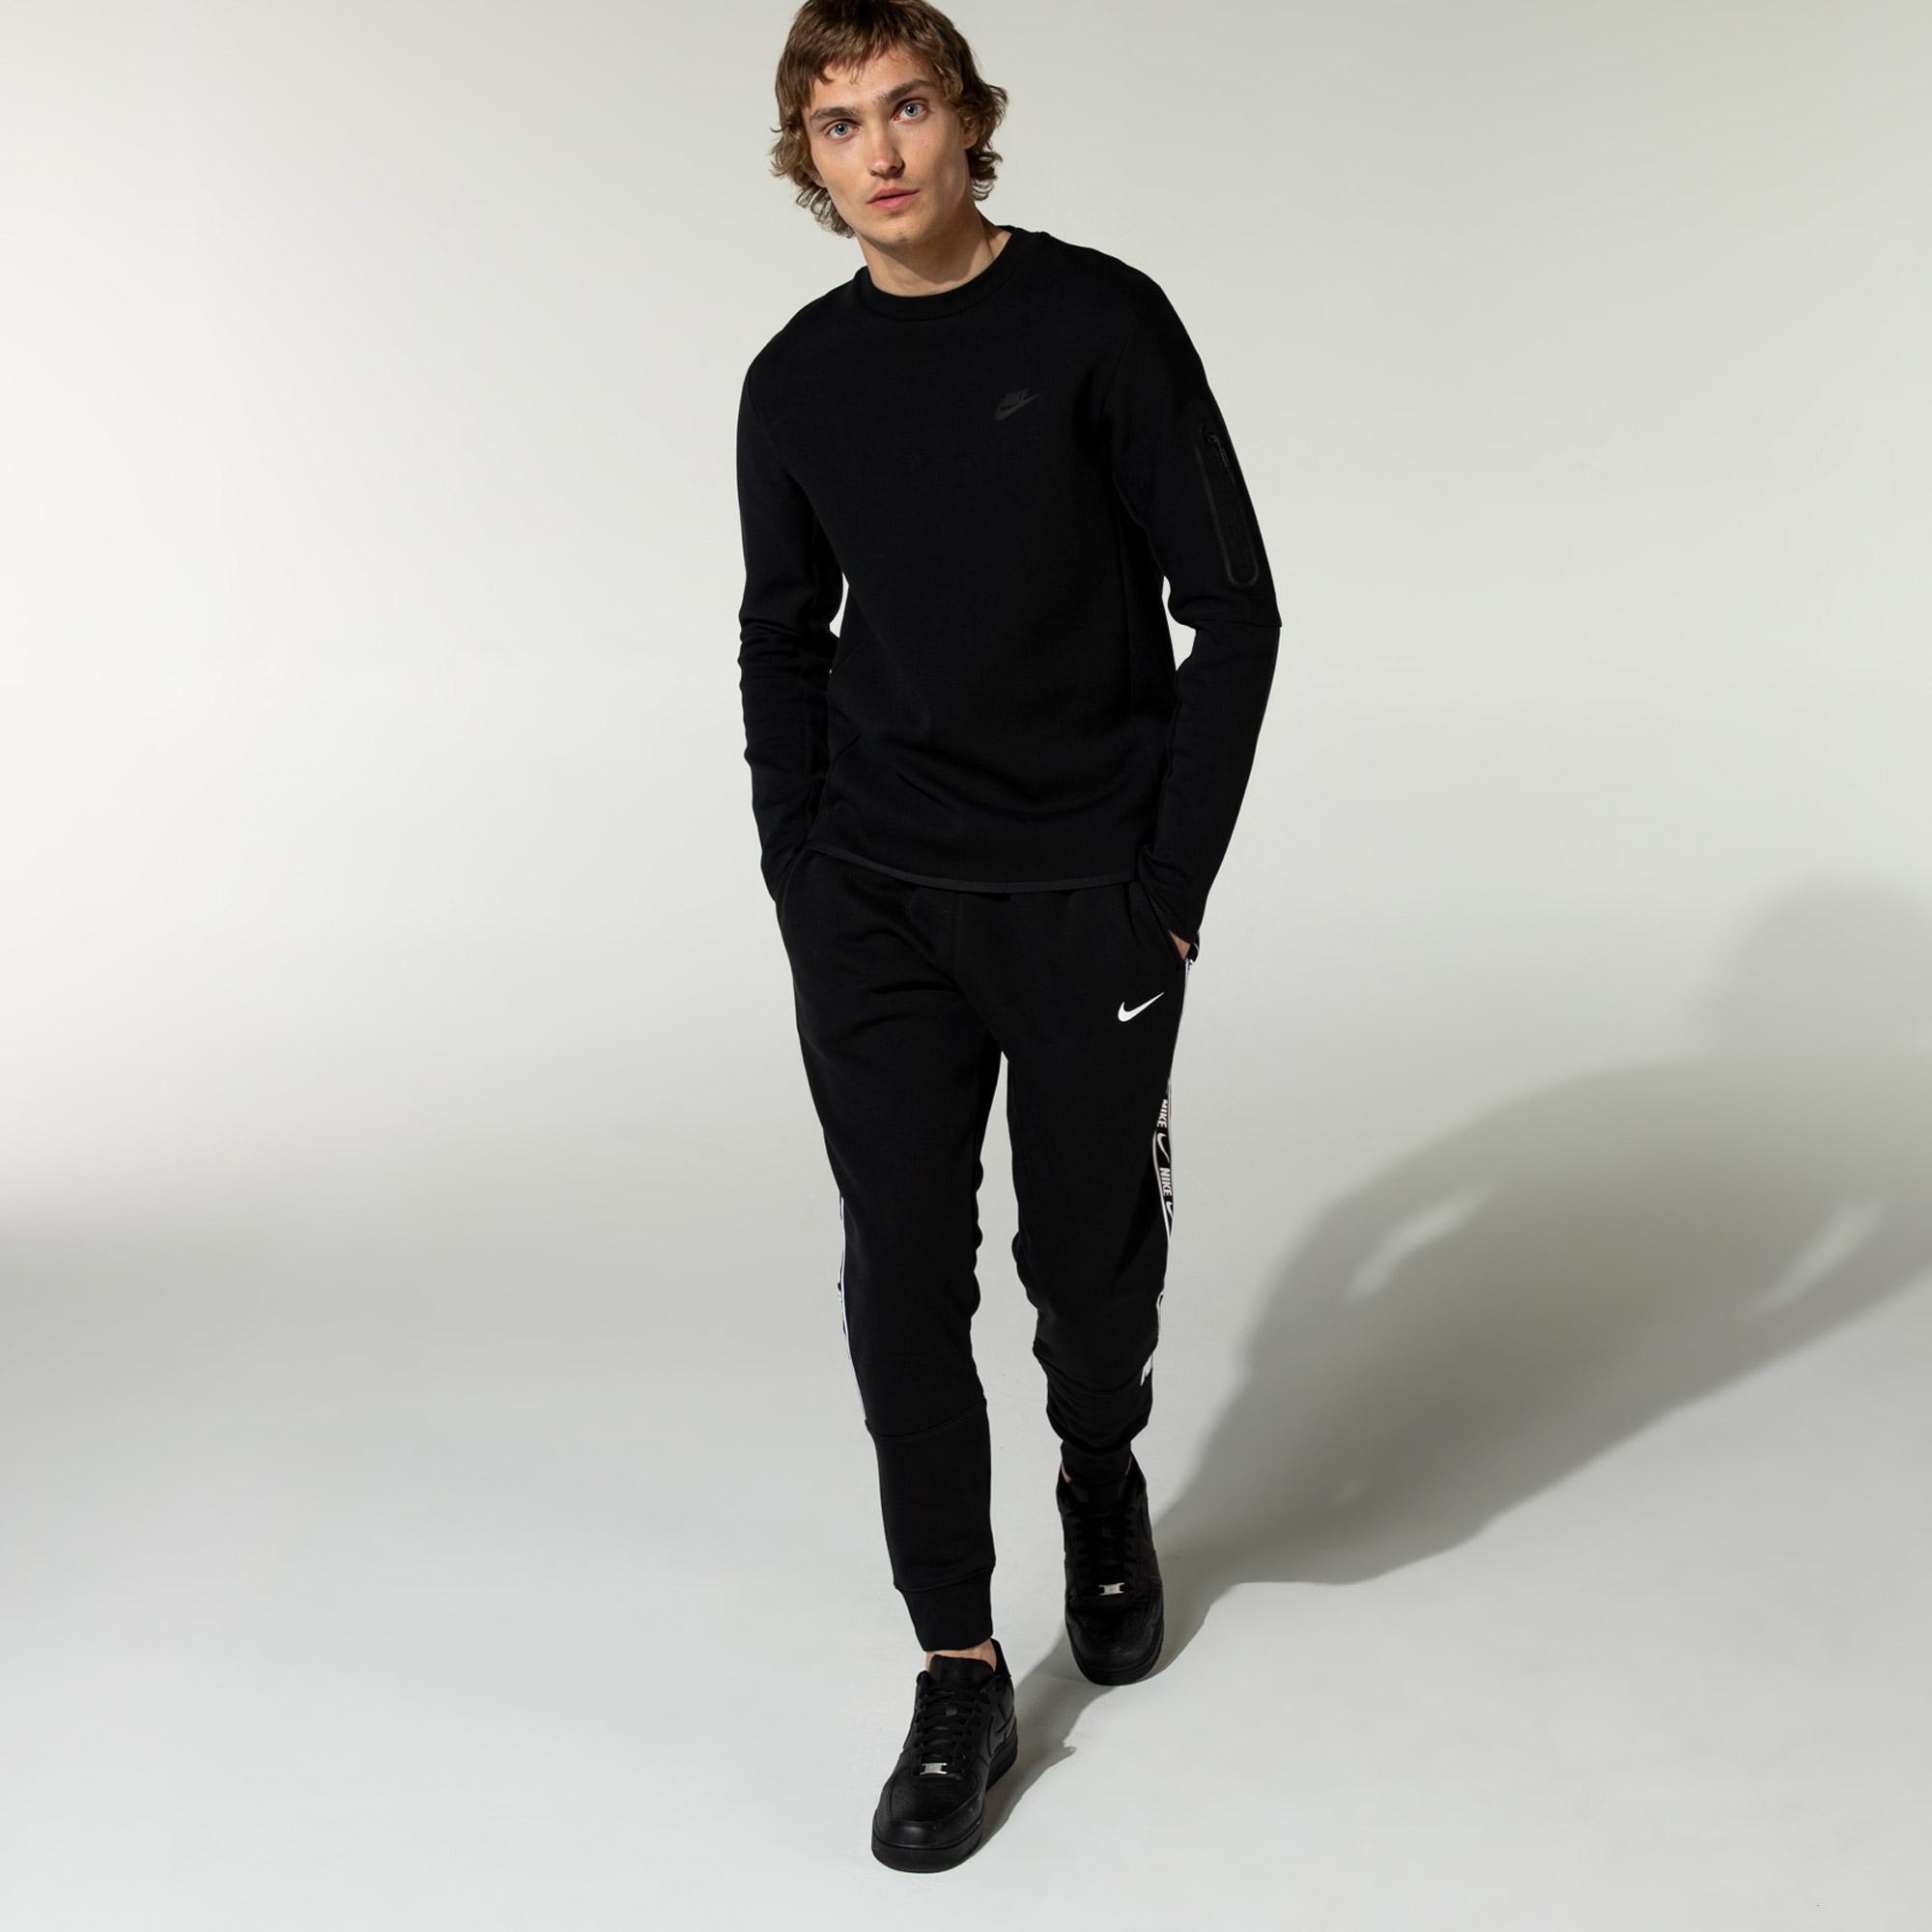 Nike Sportswear Erkek Siyah Eşofman Altı